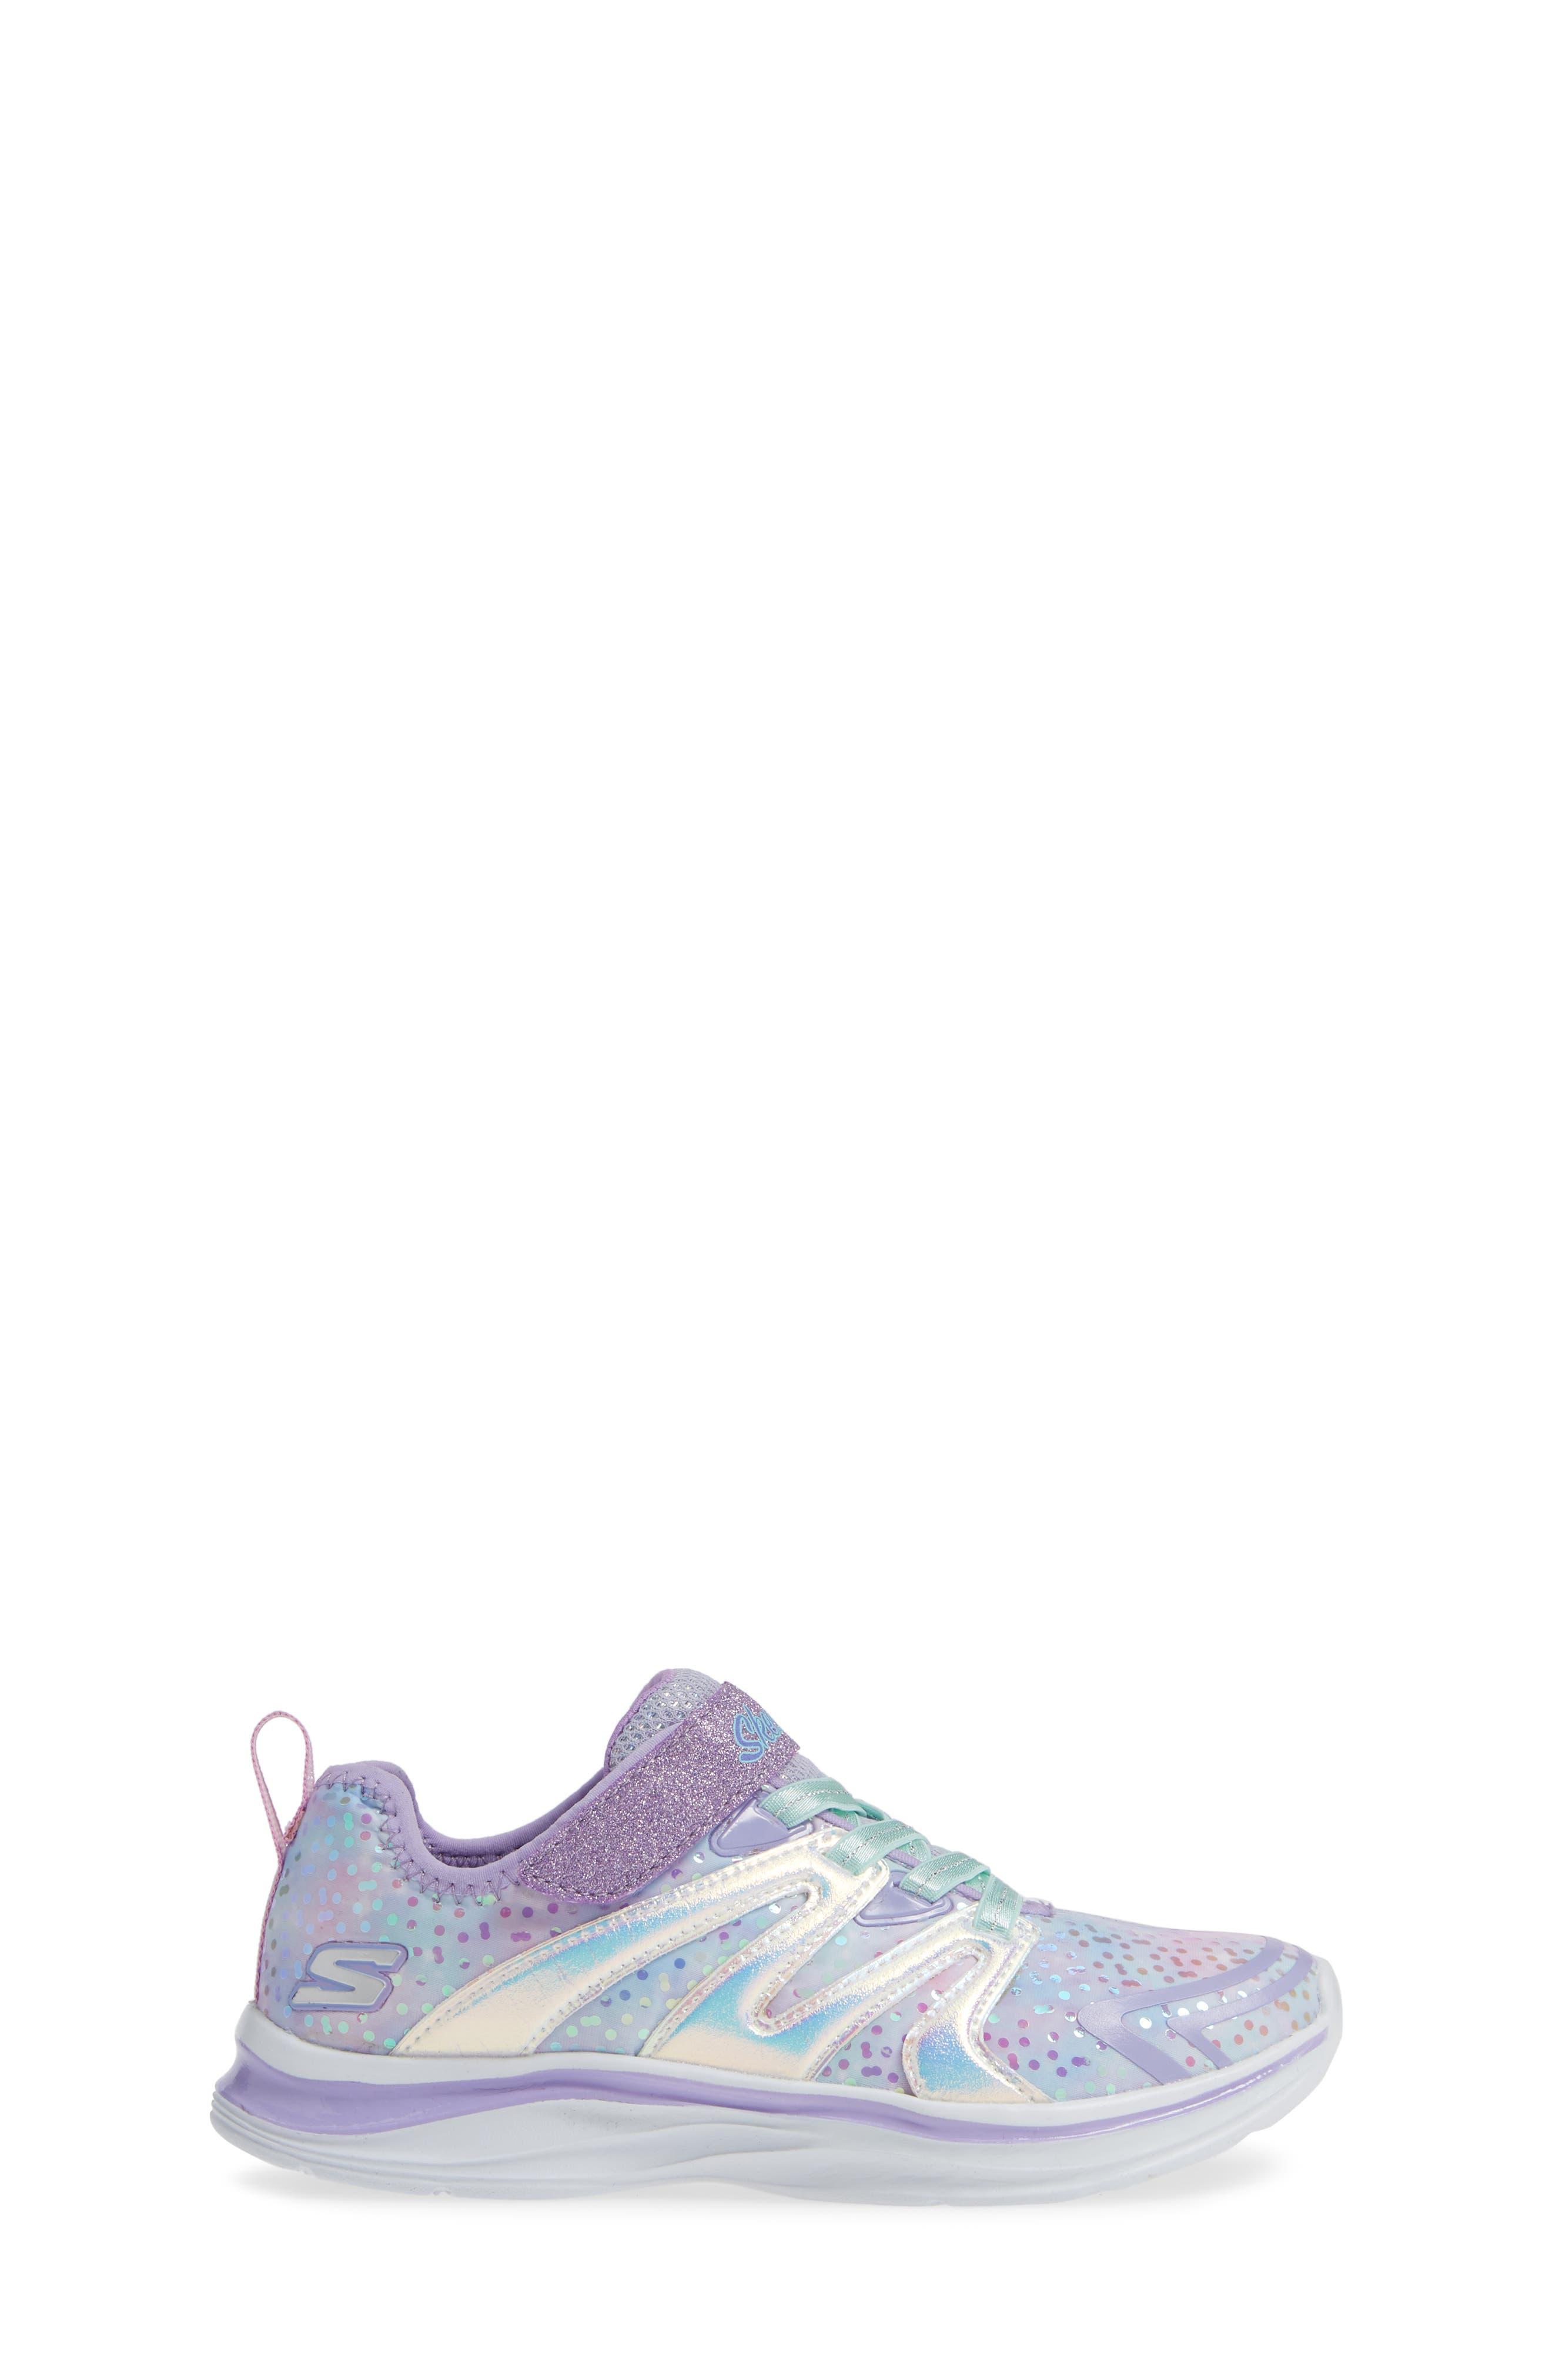 Double Dreams Shimmer Sneaker,                             Alternate thumbnail 3, color,                             LAVENDER/ MULTI